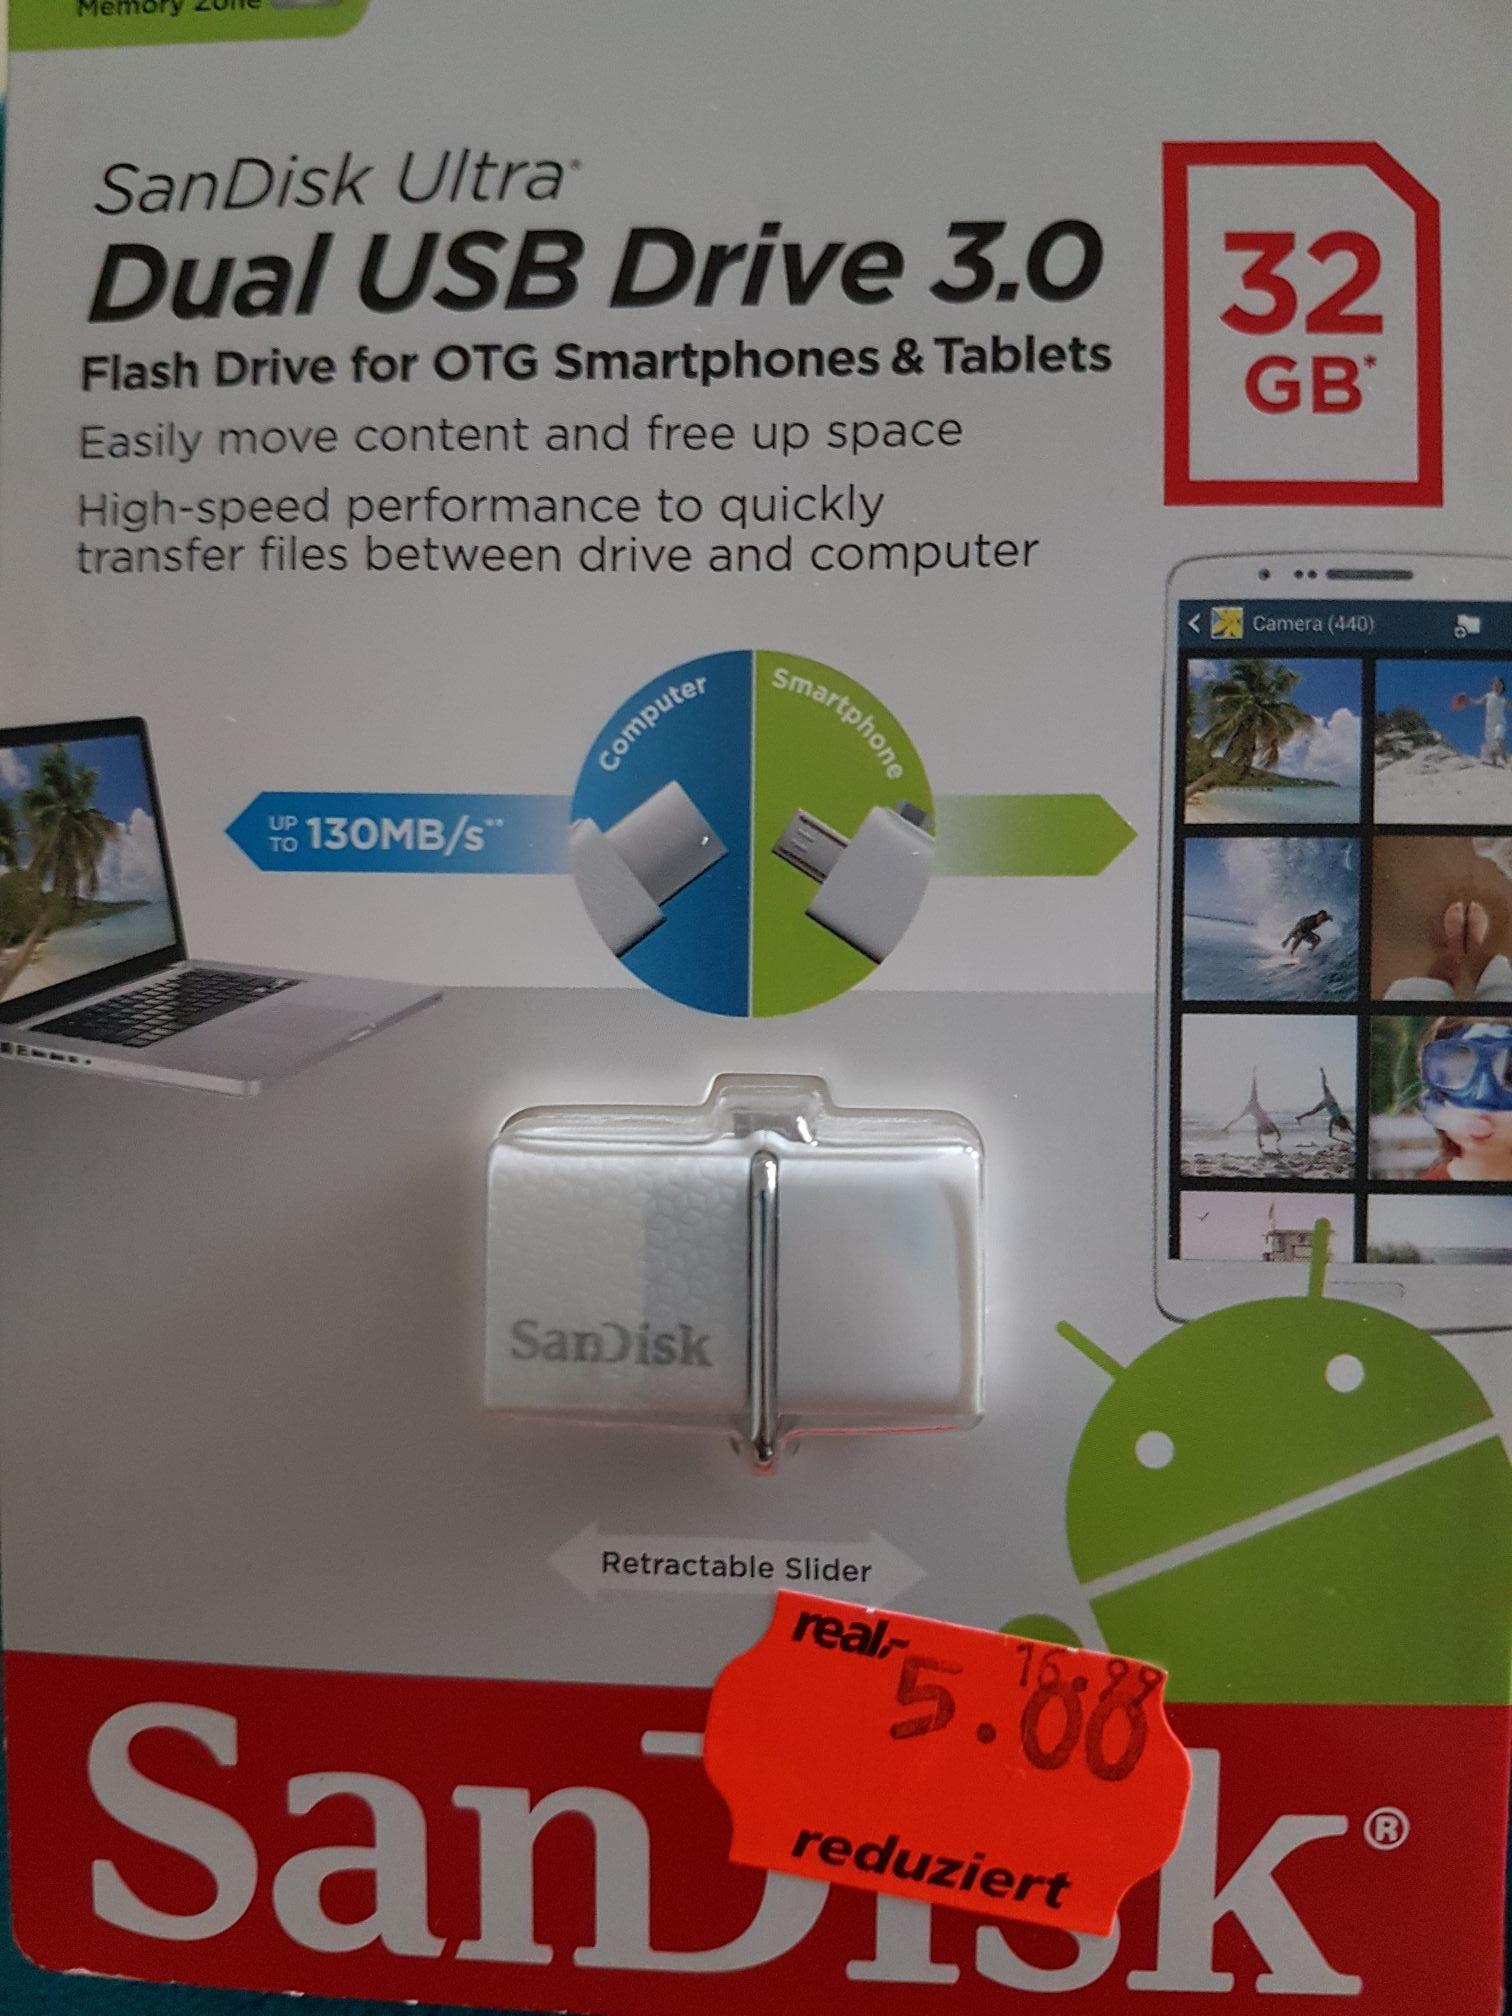 USB 3.0 Dual Stick *offline* Real Cuxhaven